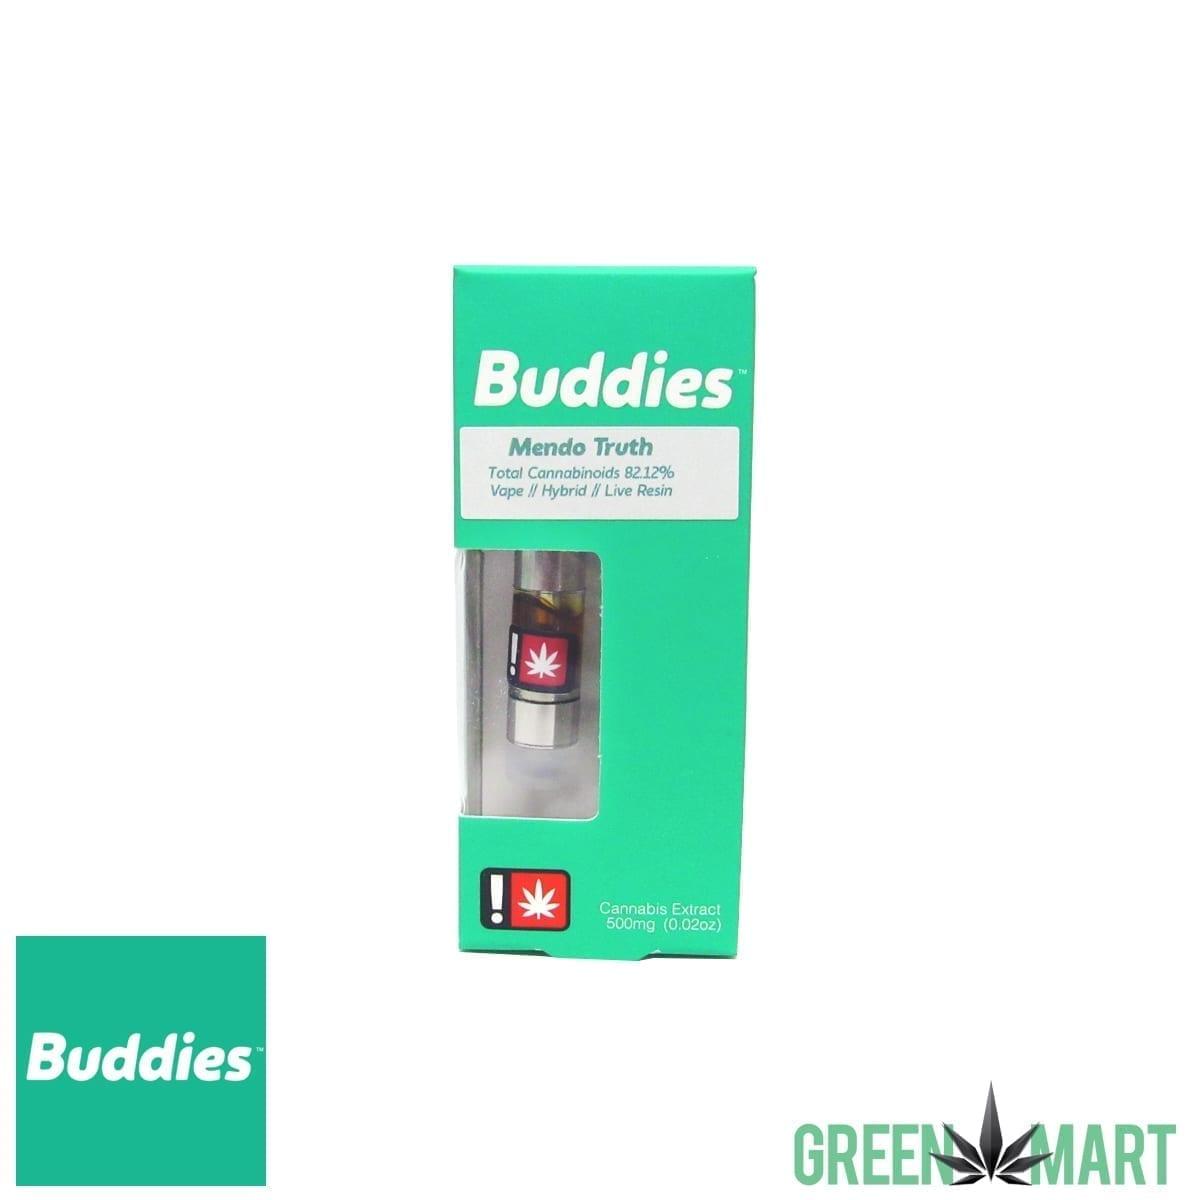 Buddies Brand Distillate Cartridge - Mendo Truth Live Resin